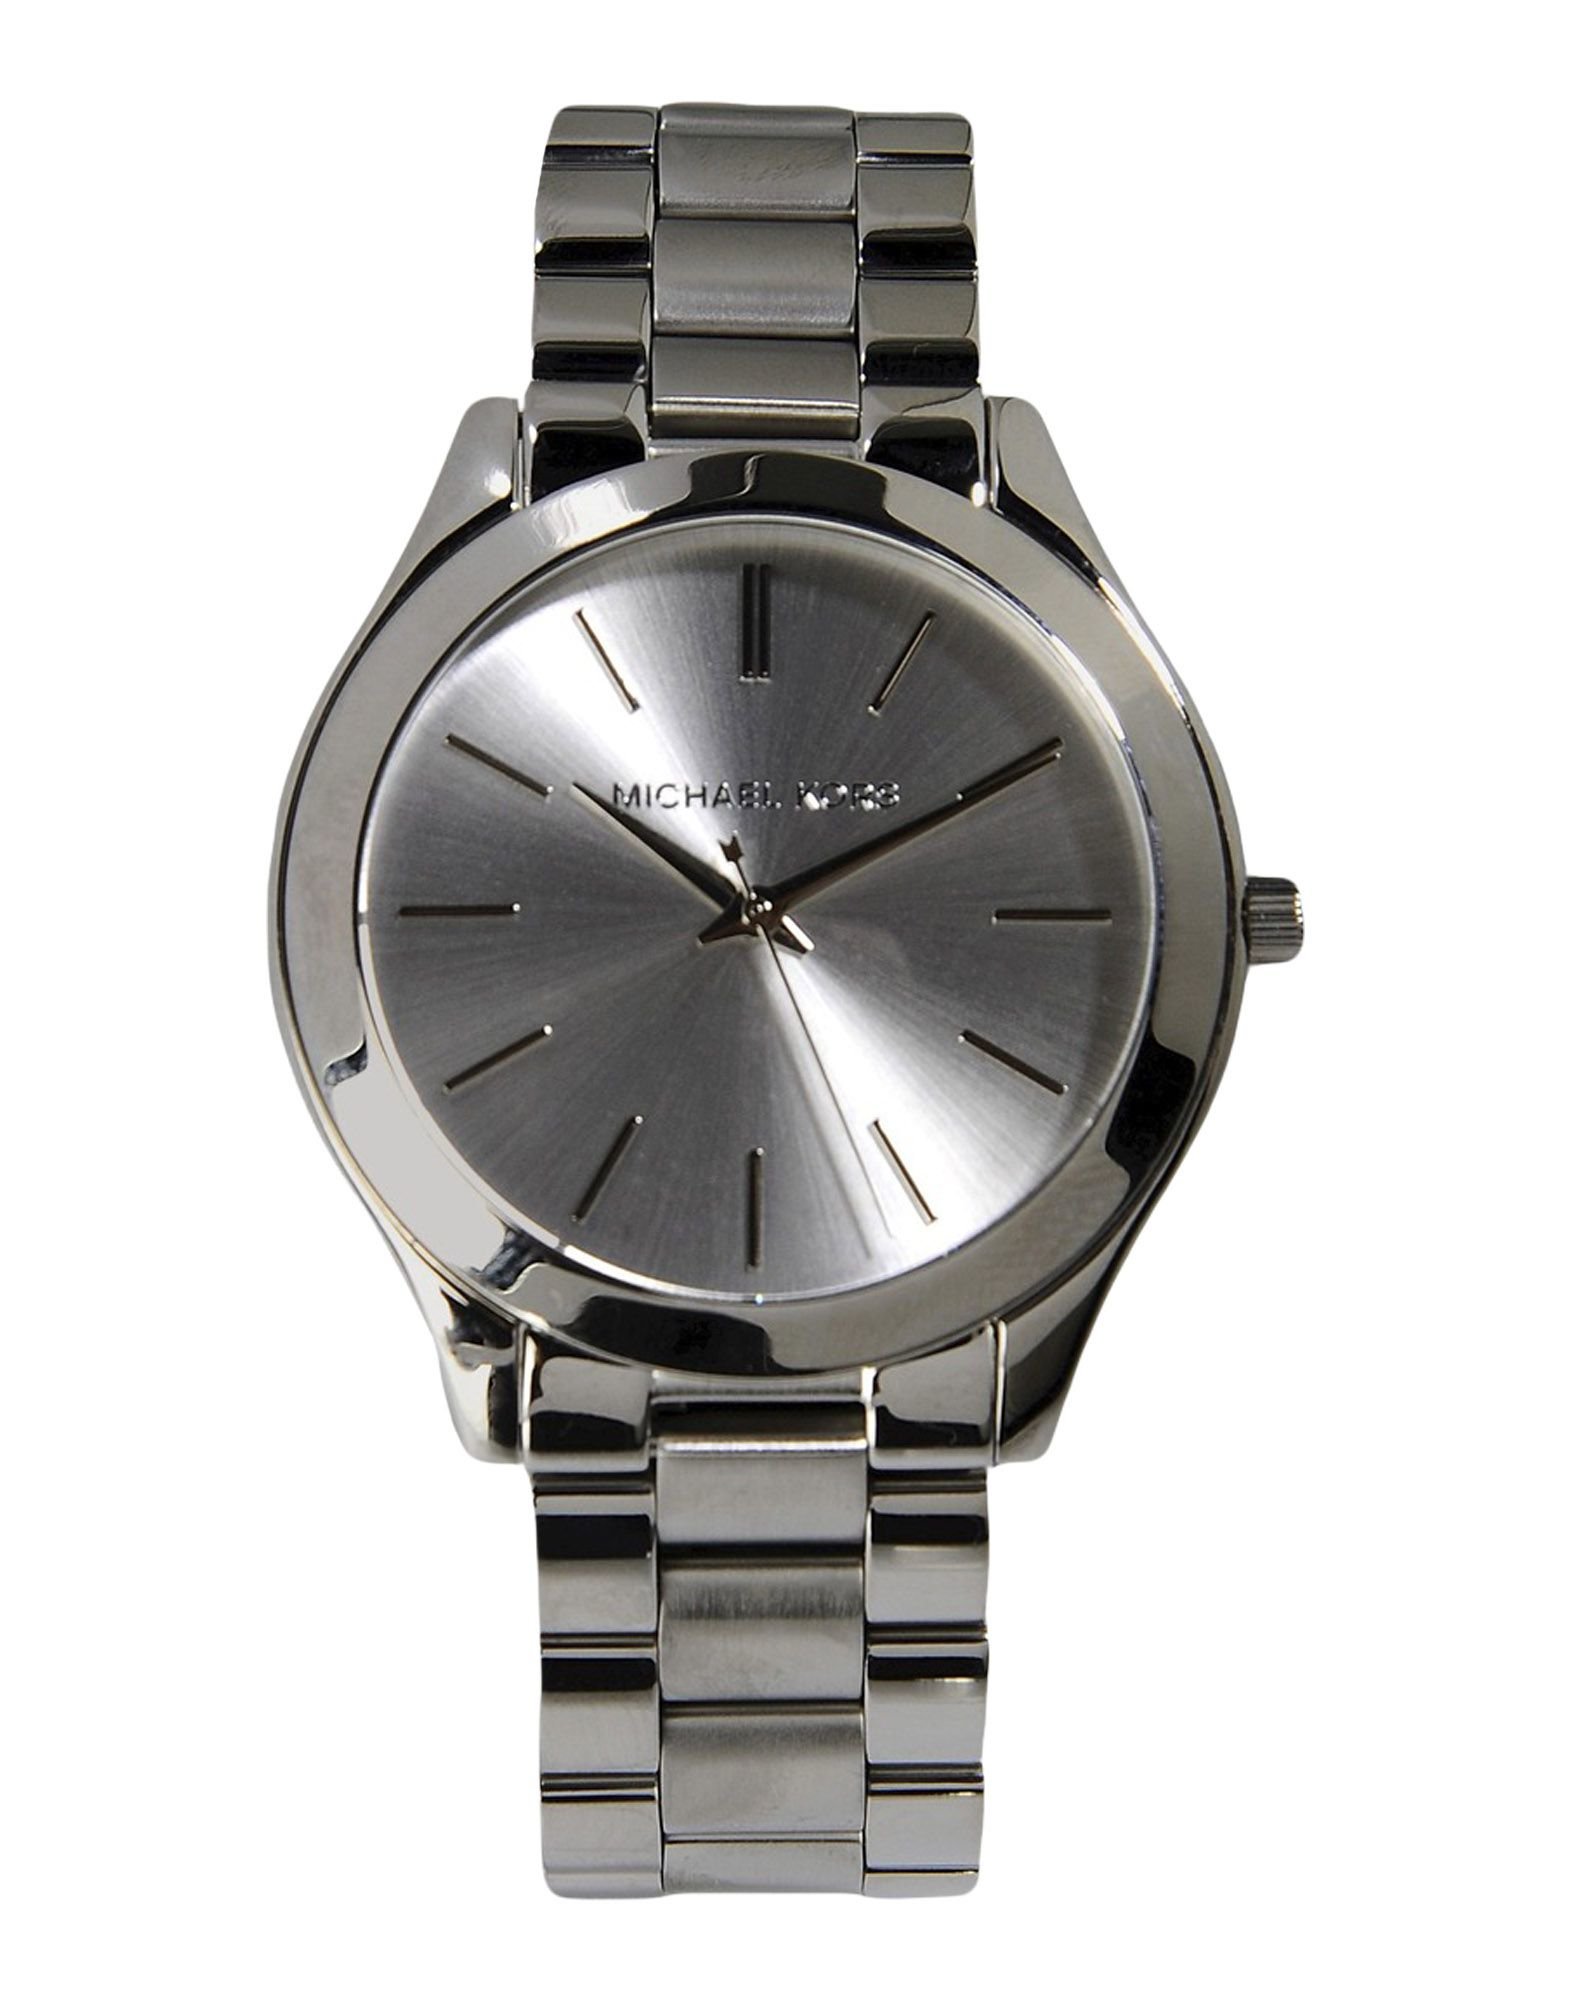 3612ff3d24f1 Michael Kors Women s MK5612  Blair  Silver. Mesmerize and captivate with Michael  Kors women s watches from Overstock.com. This Michael Kors Watch is.